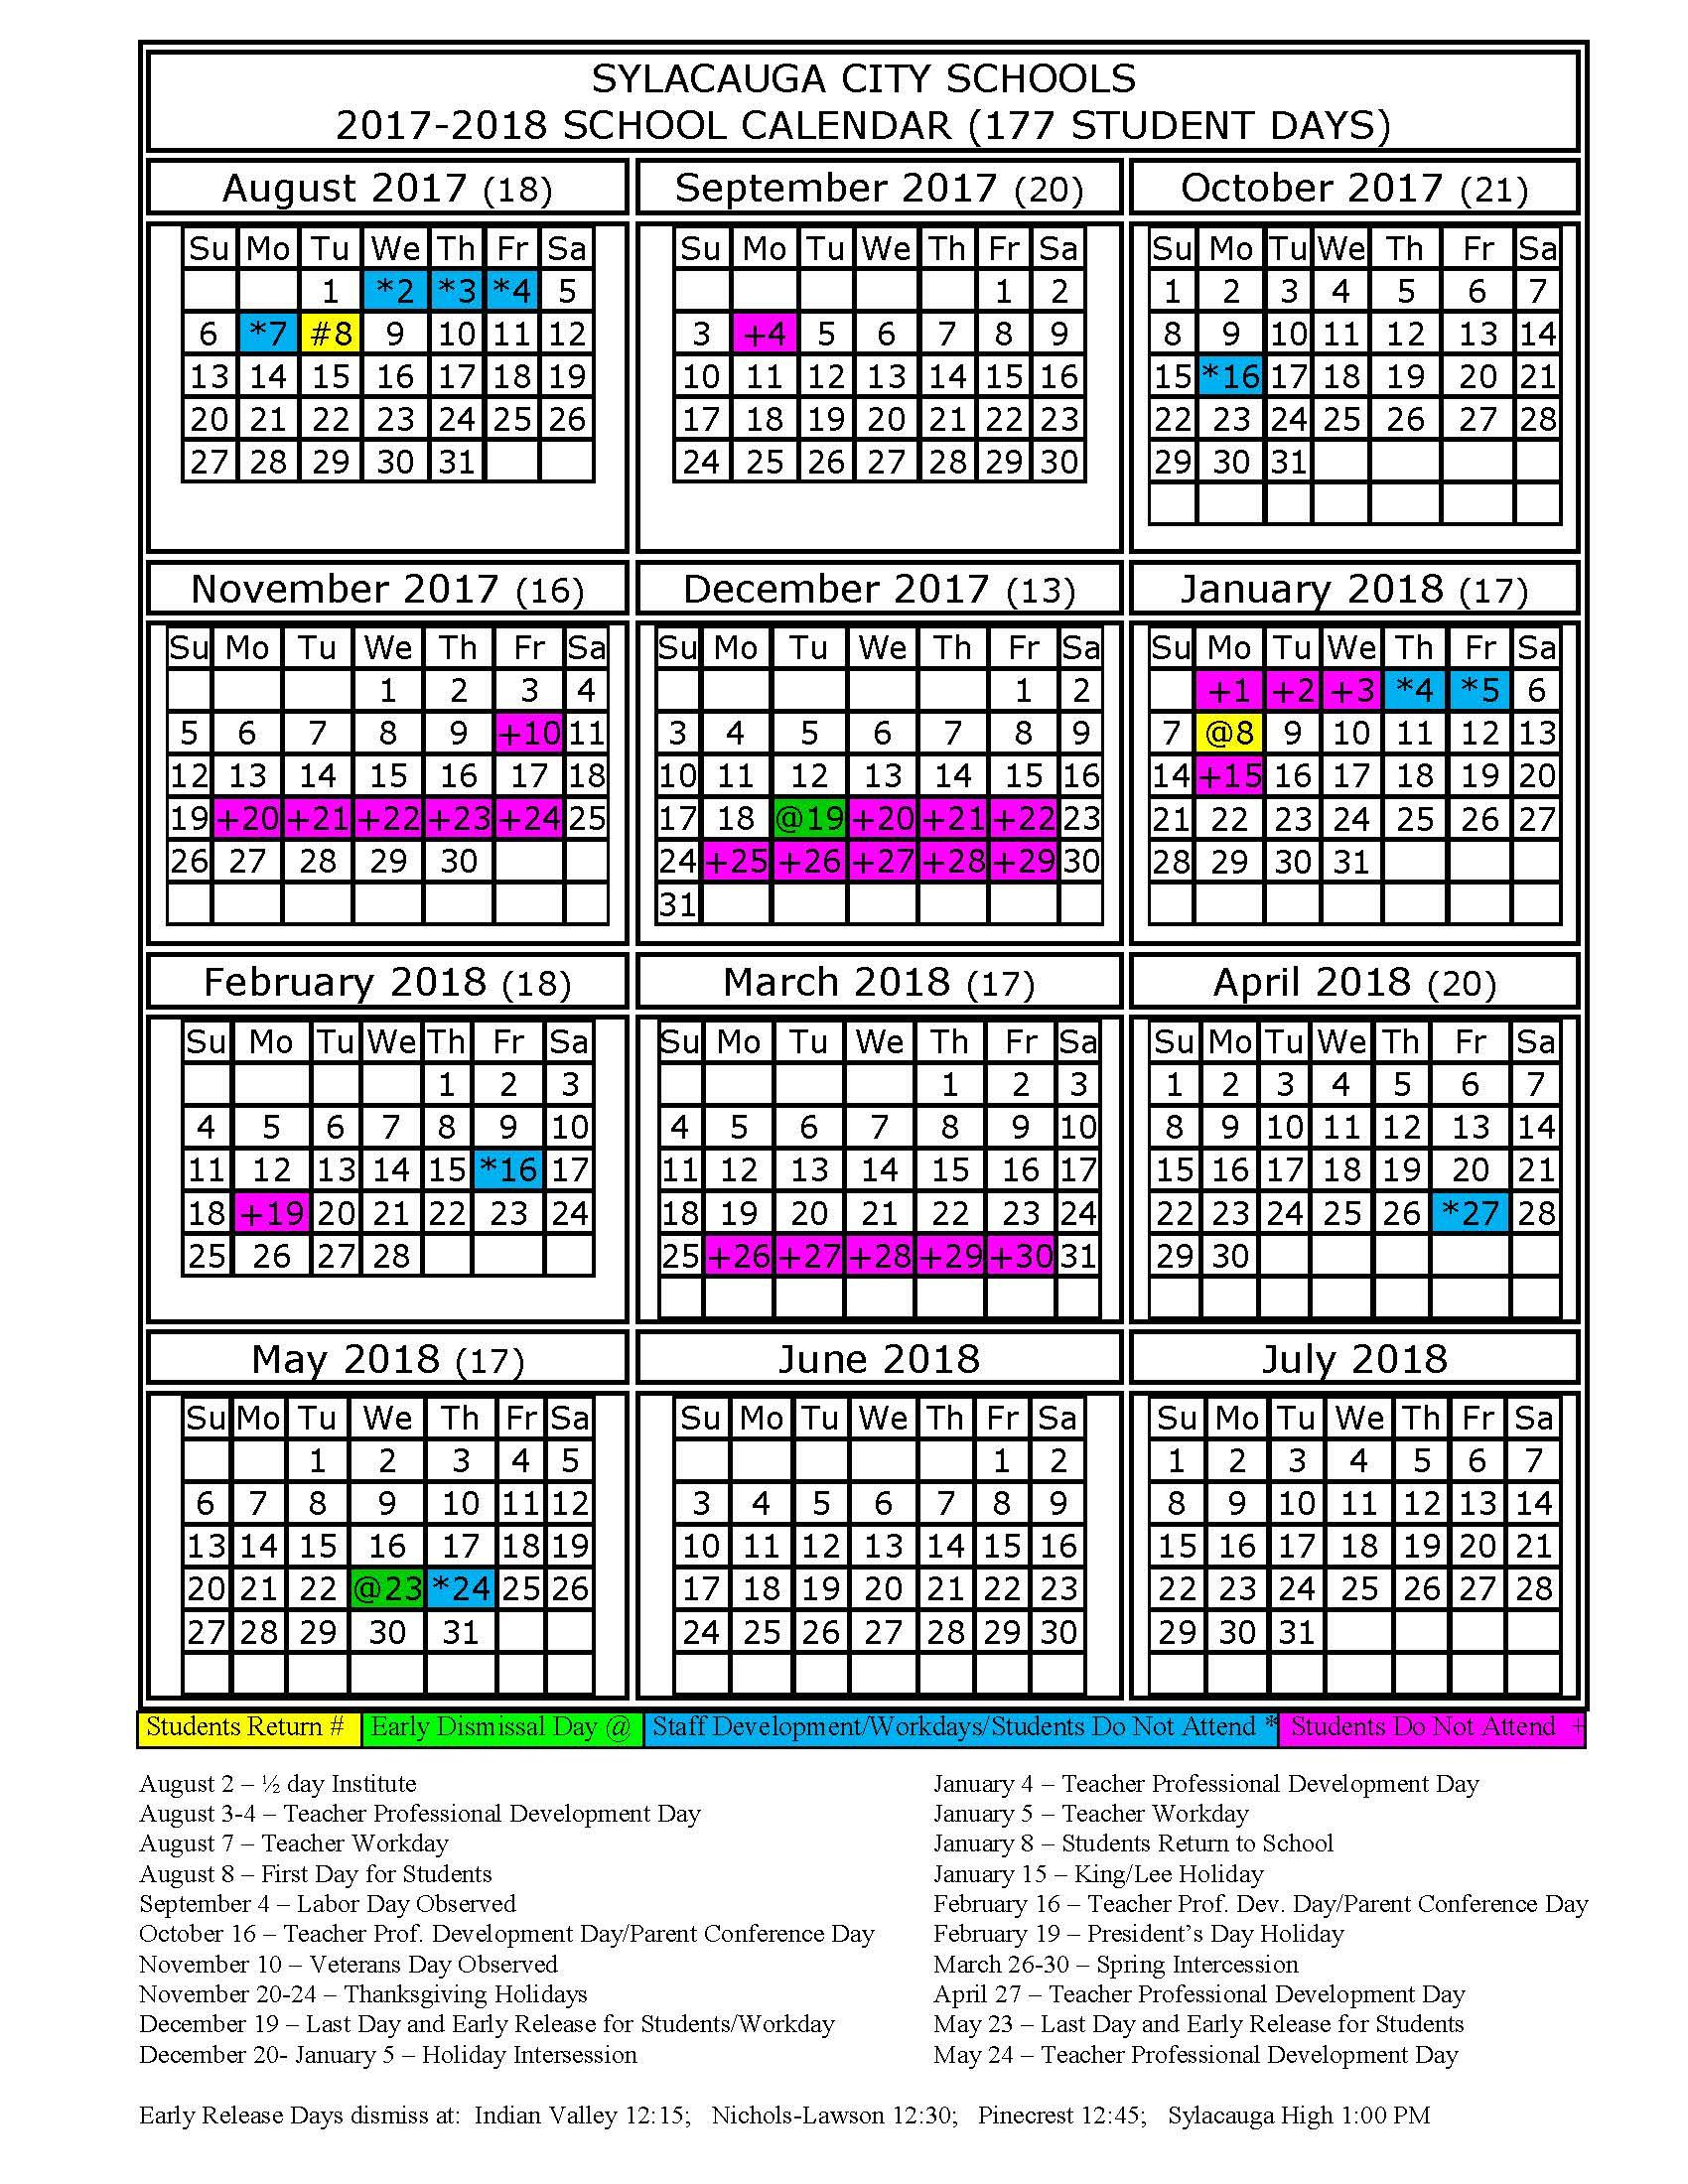 2017-2018 System Calendar